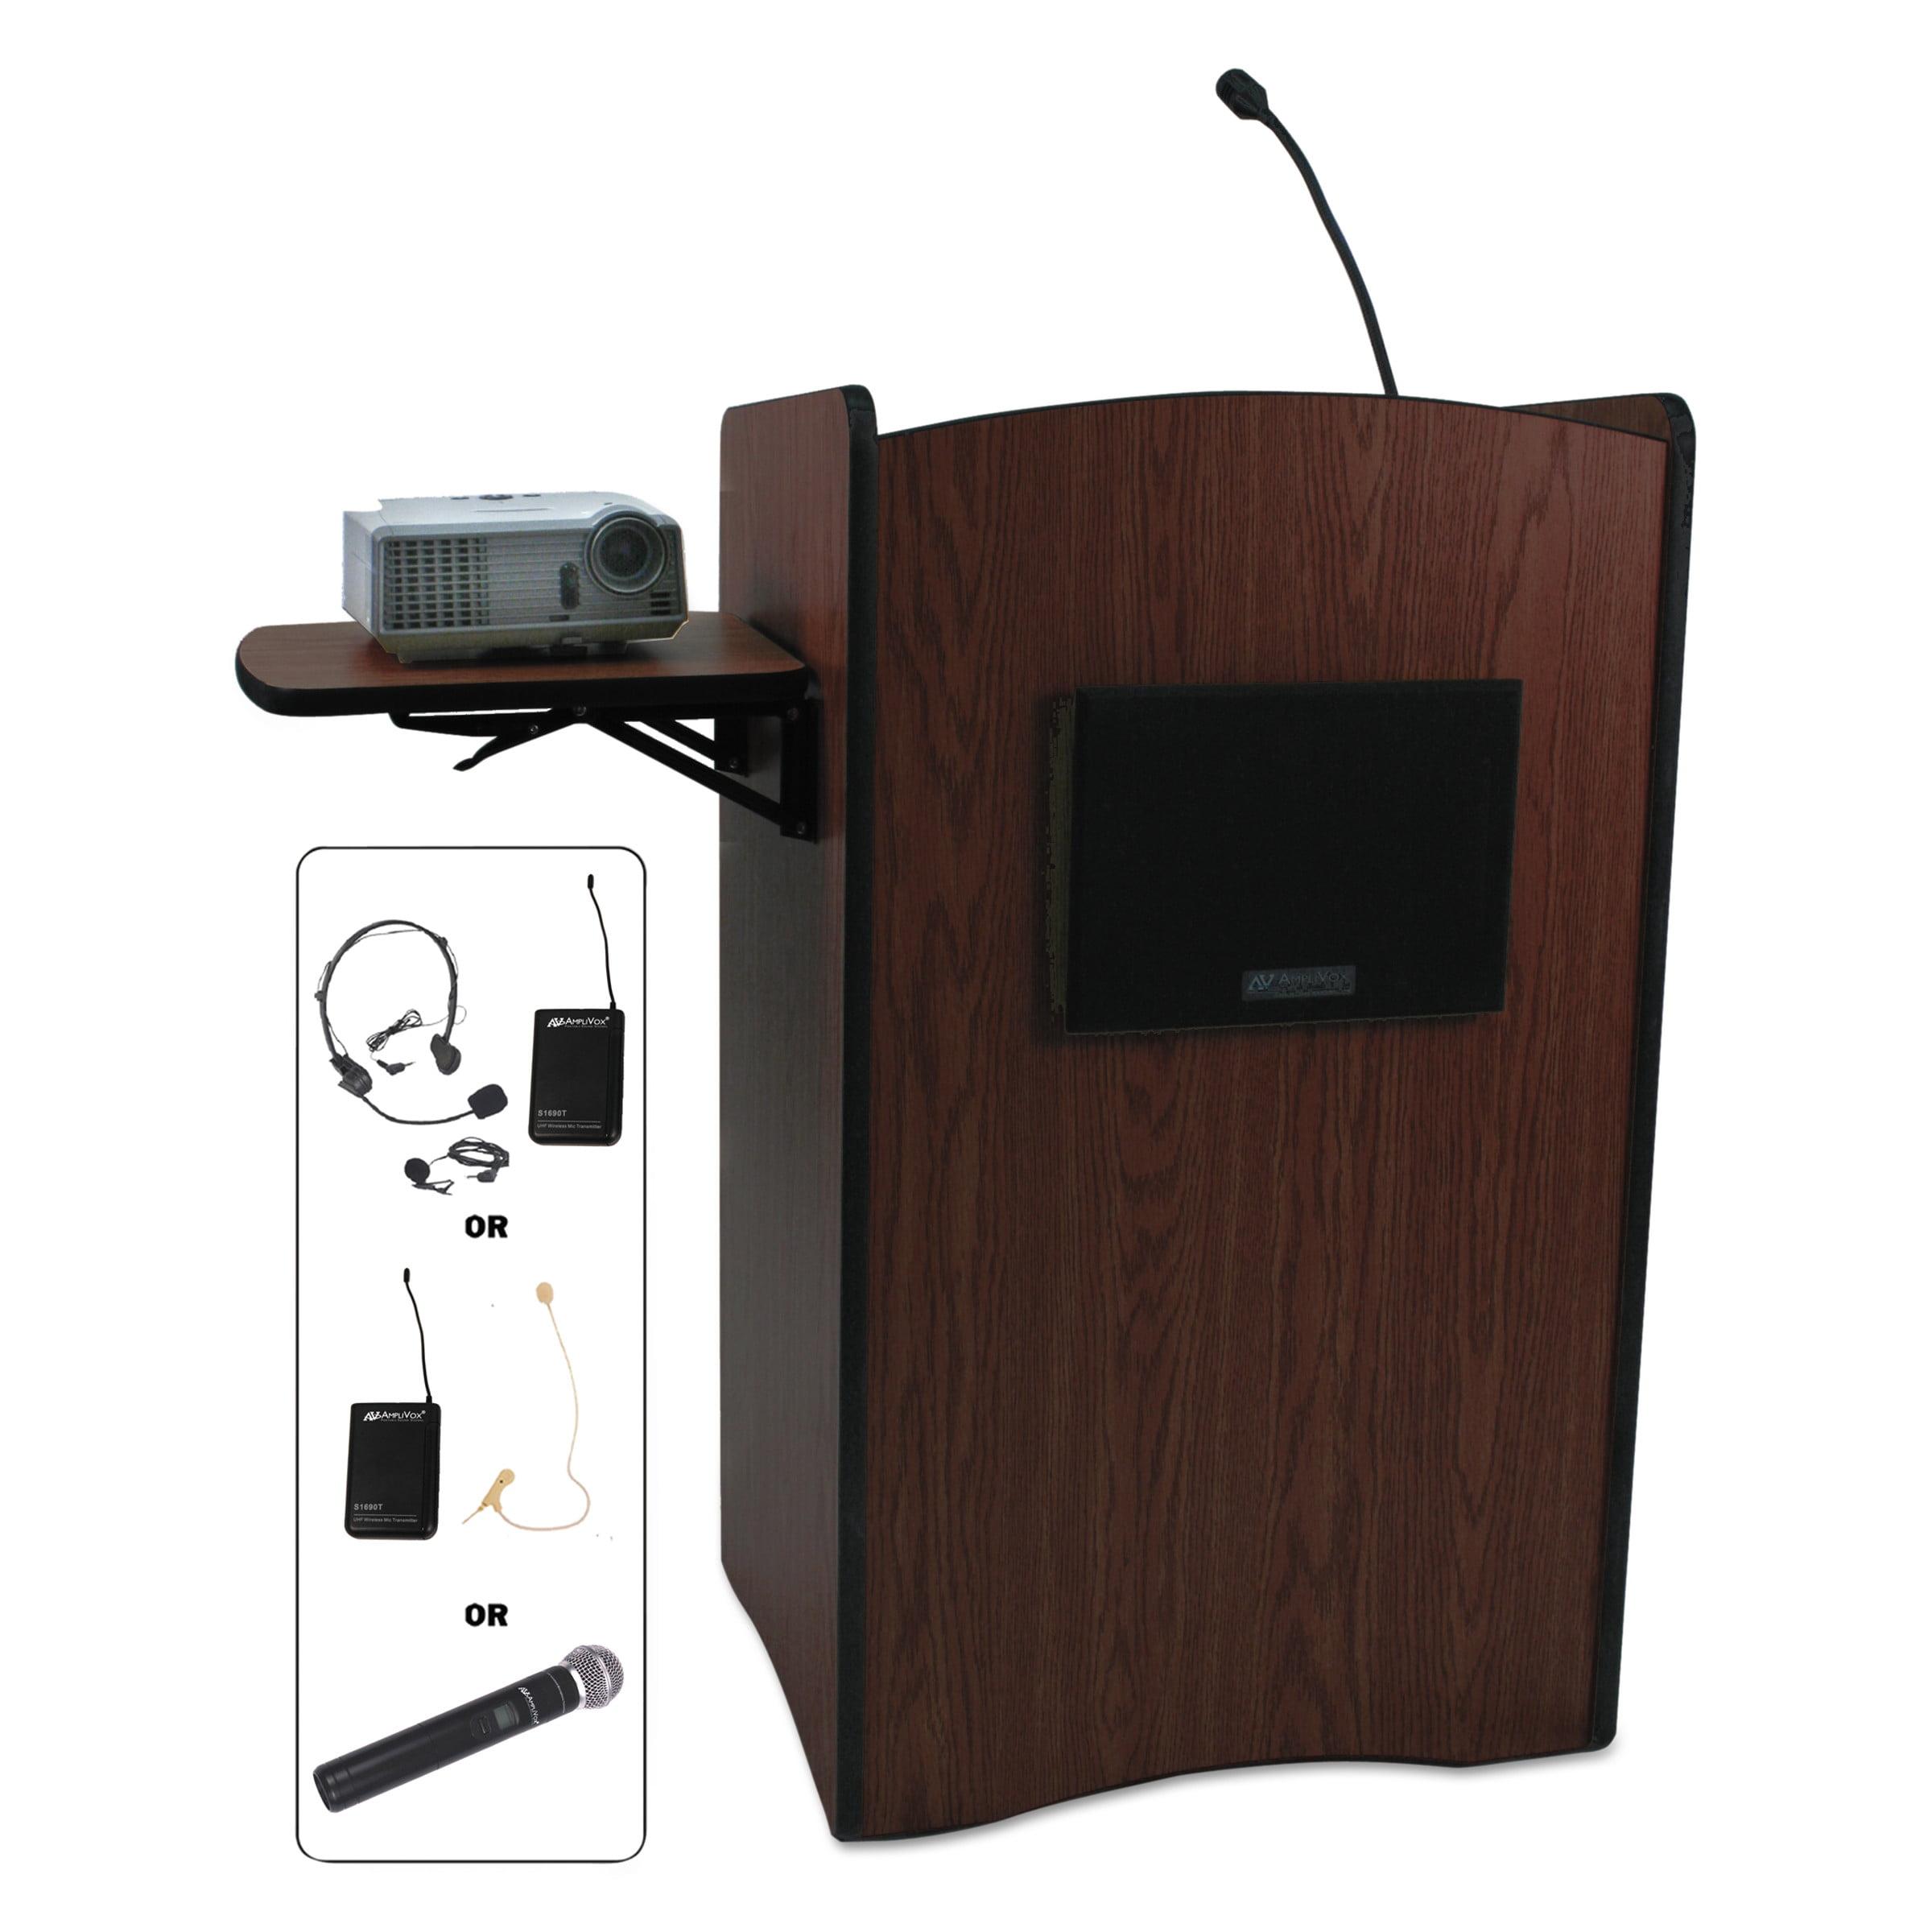 AmpliVox Multimedia Smart Computer Wireless Lectern, 25-1/2w x 20-1/4d x 43-1/2h,Mahogany